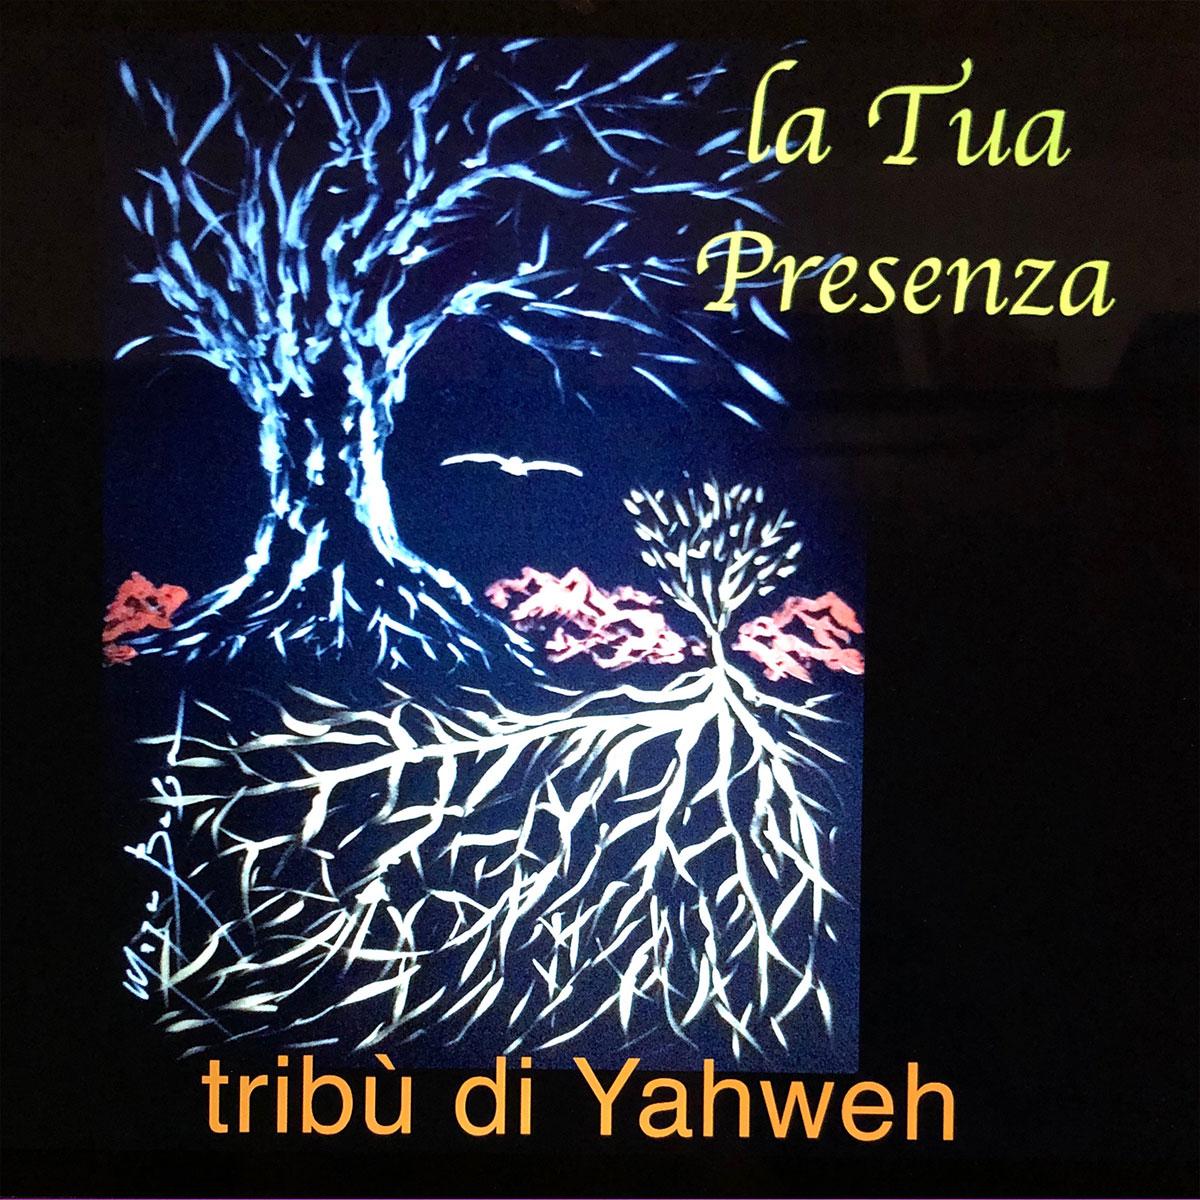 https://www.tribudiyahweh.com/wp/wp-content/uploads/2019/02/la-tua-presenza.jpg